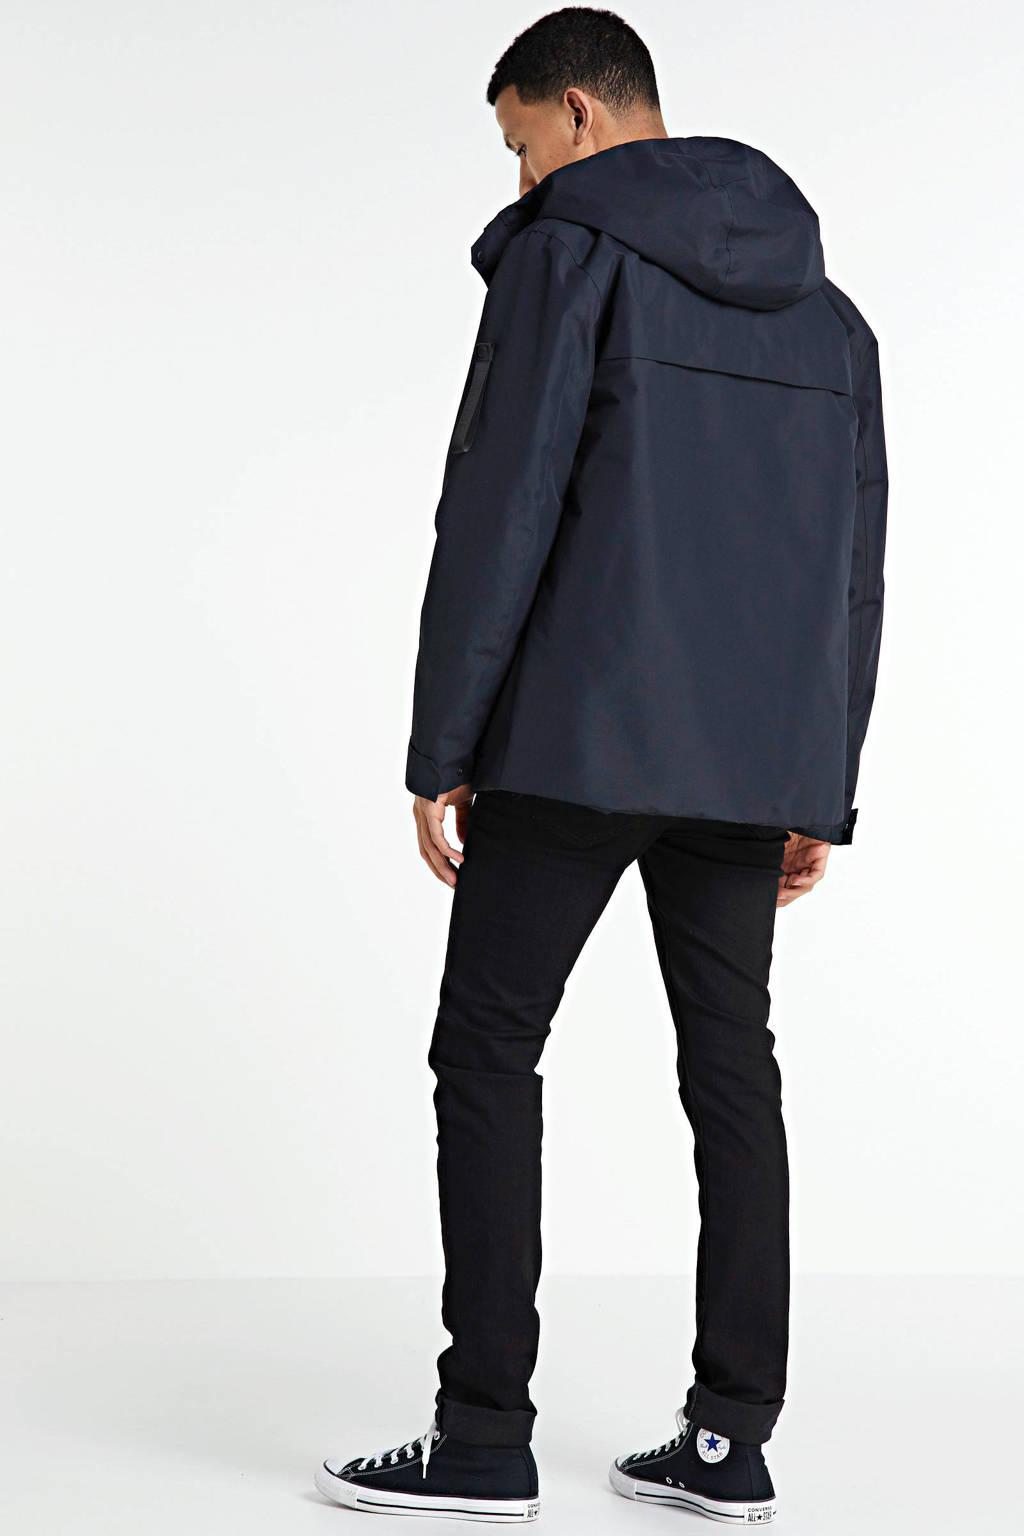 Levi's super skinny fit jeans 519 stylo, STYLO ADV